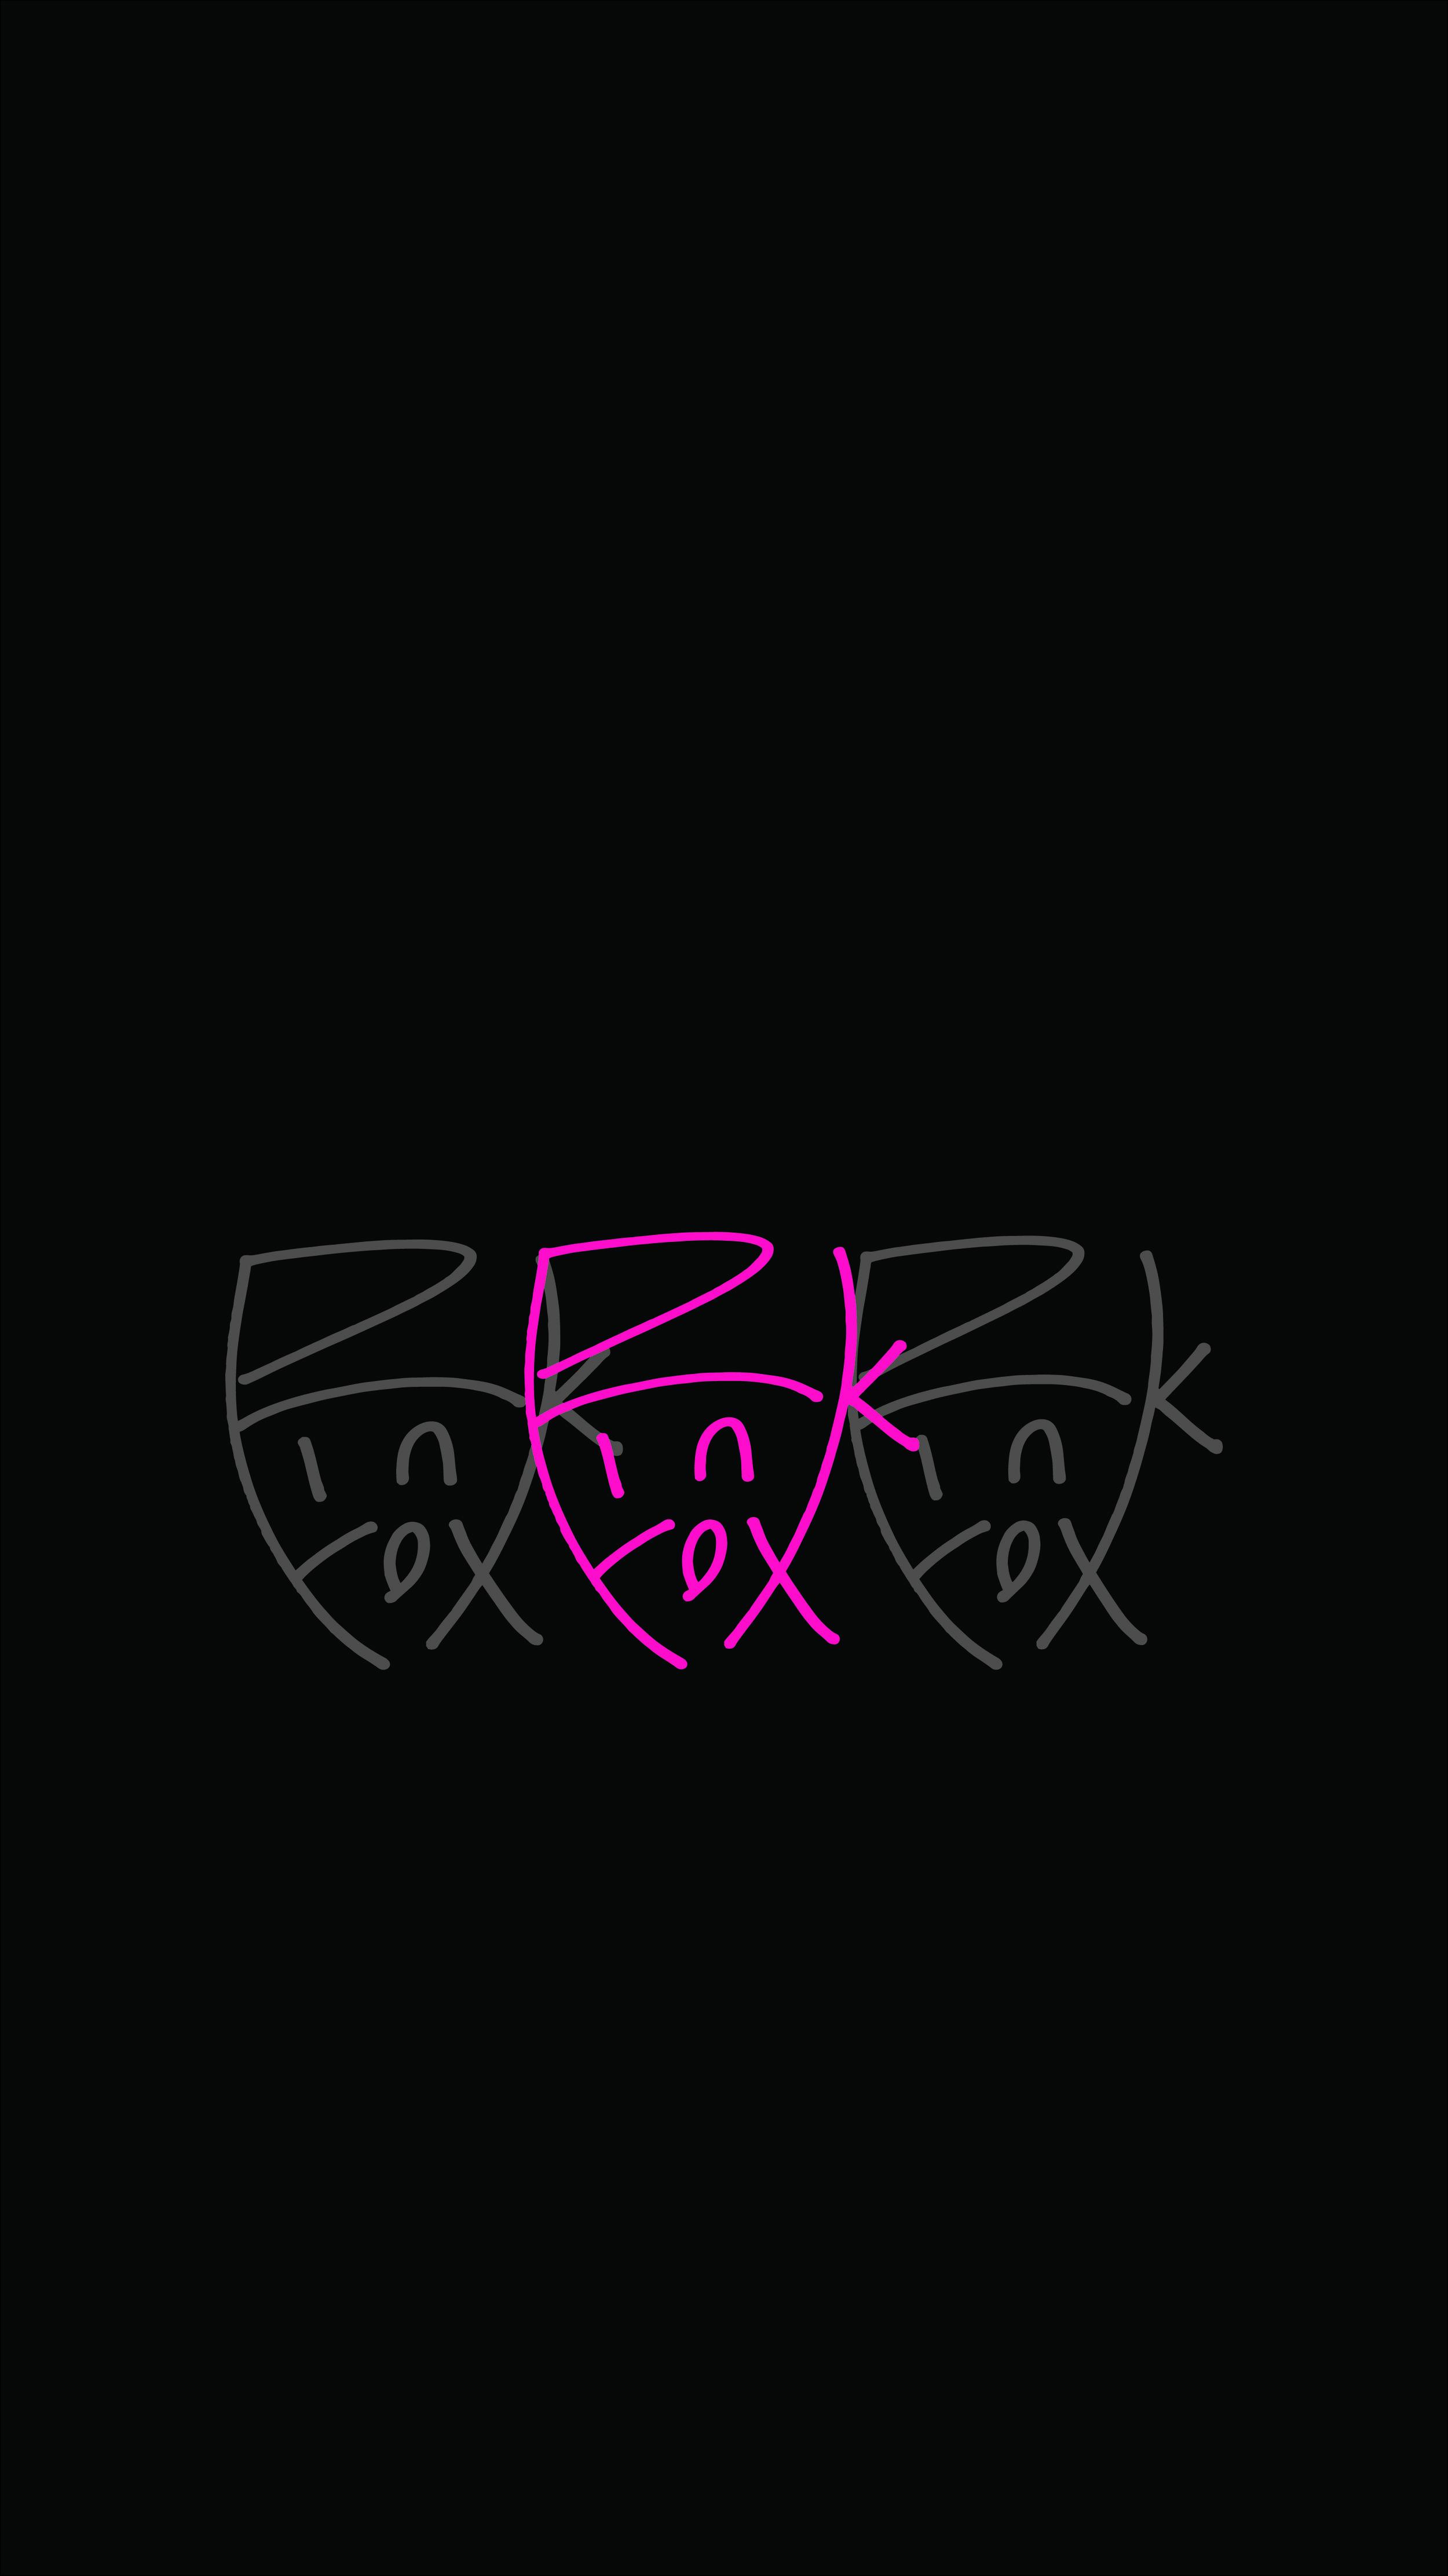 iPhone 8 BG - Three Faces Black.jpg